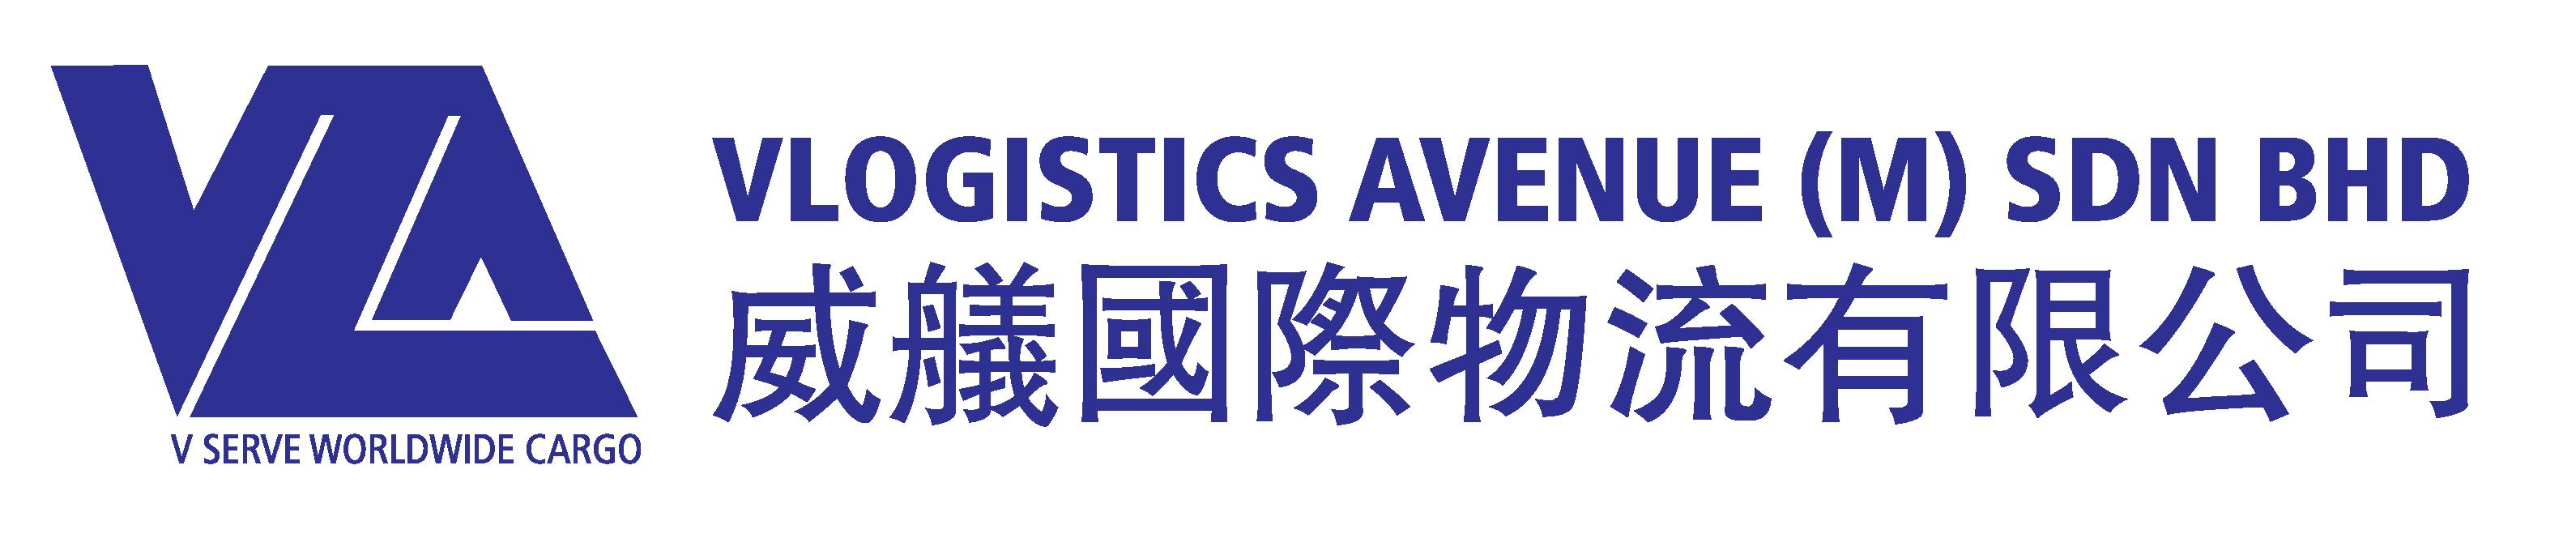 Vlogistics Avenue